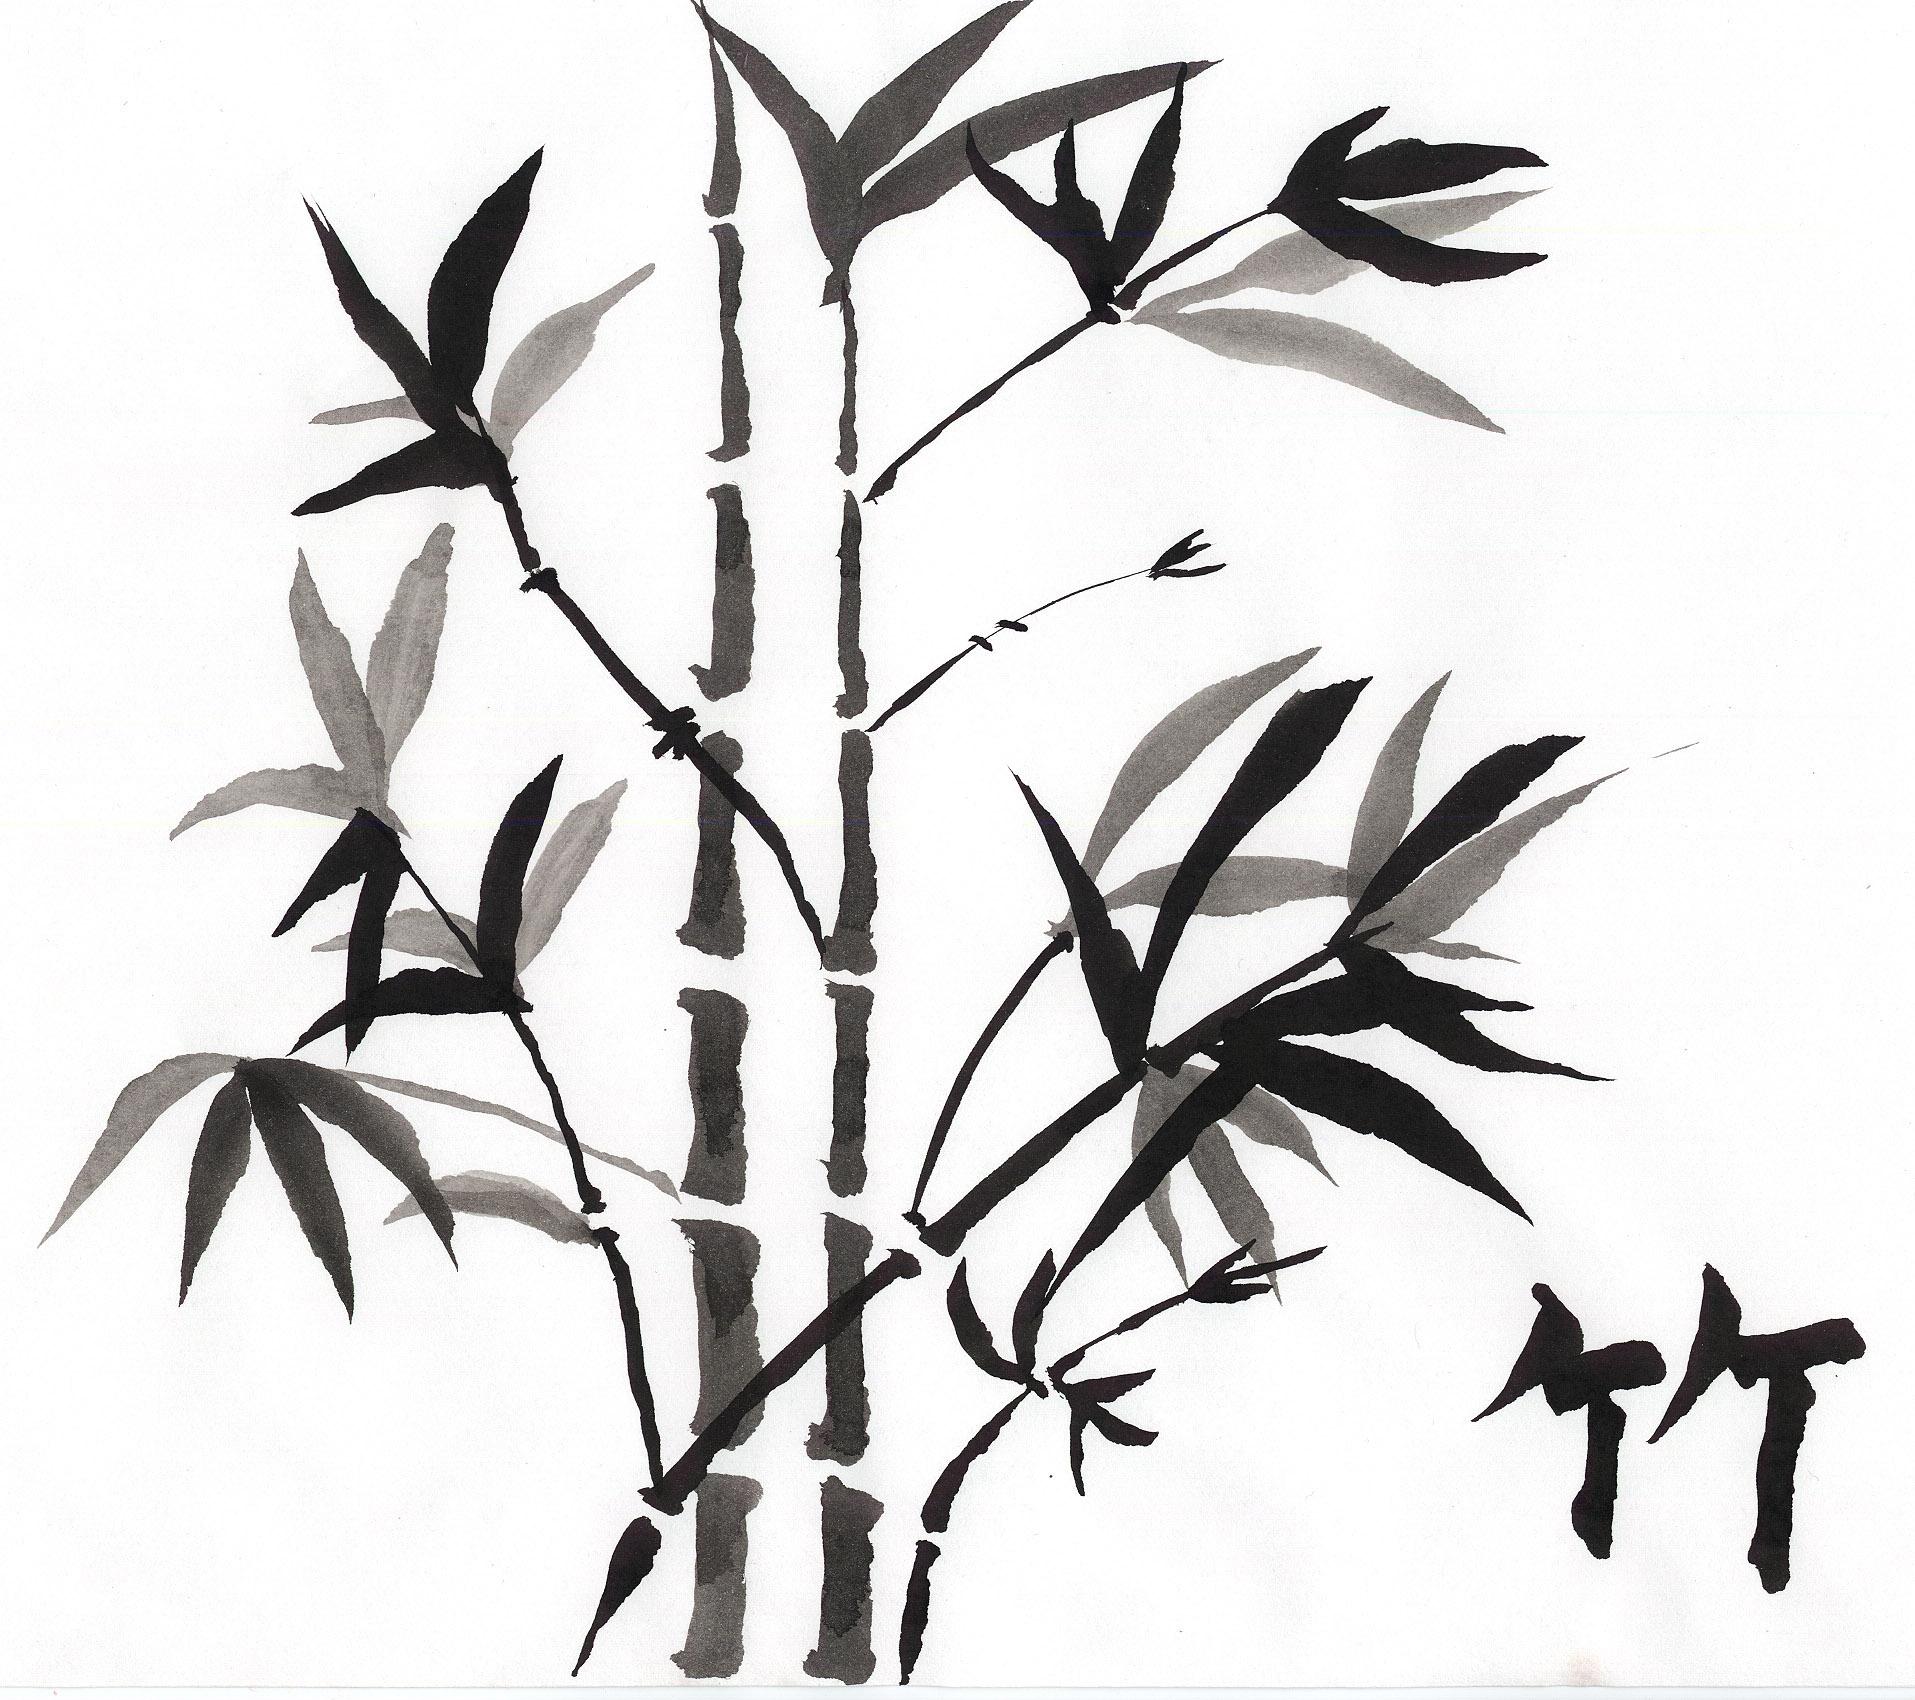 Drawn bamboo Bamboo Shoots Jeri · by